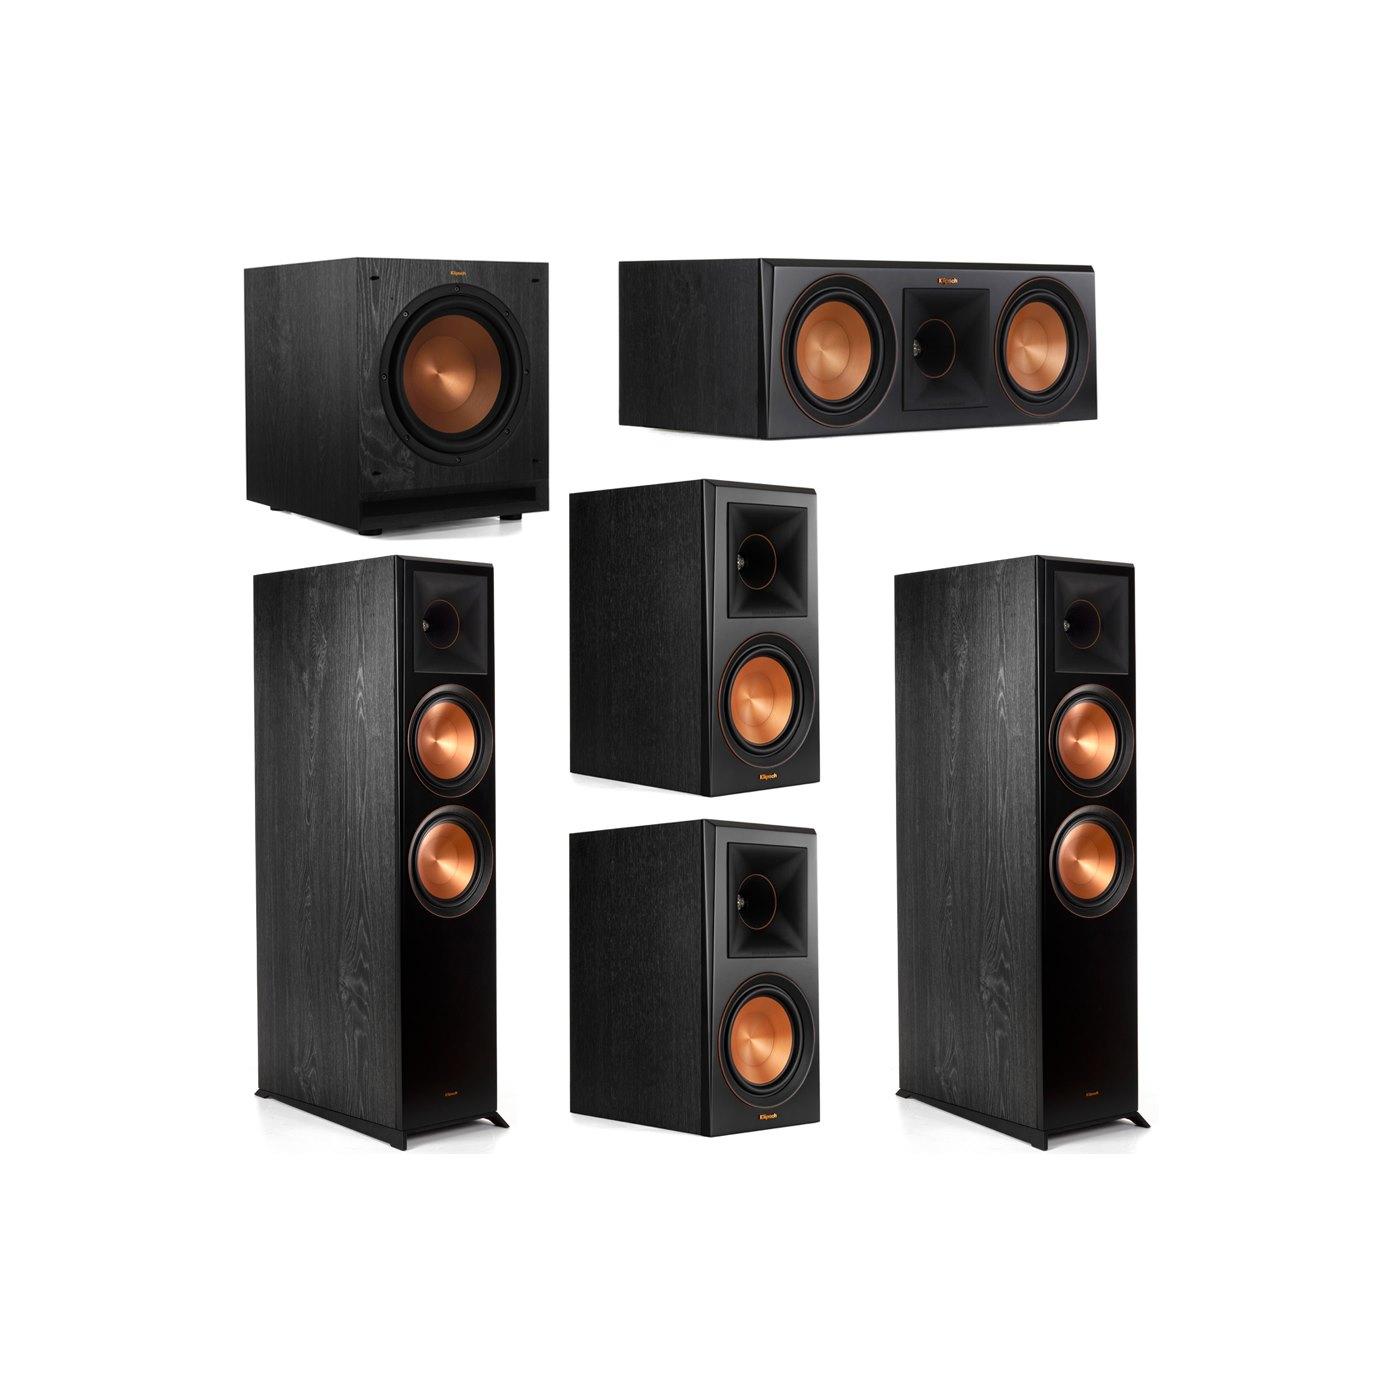 Klipsch 5.1 System with 2 RP-8000F Floorstanding Speakers, 1 Klipsch RP-600C Center Speaker, 2 Klipsch RP-600M Surround Speakers, 1 Klipsch SPL-100 Subwoofer